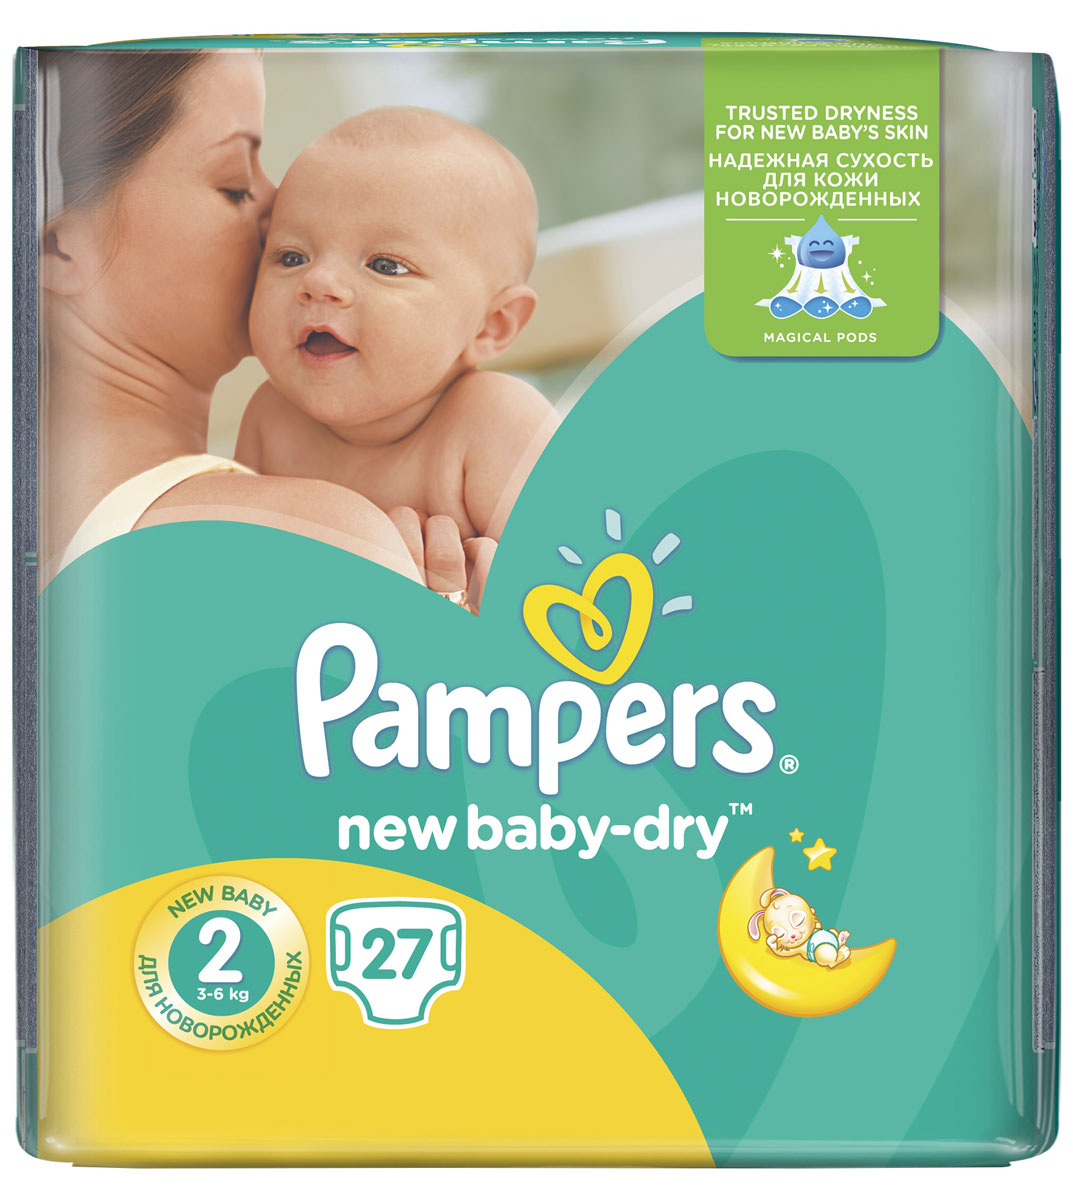 Pampers Подгузники New Baby-Dry 3-6 кг (размер 2) 27 шт